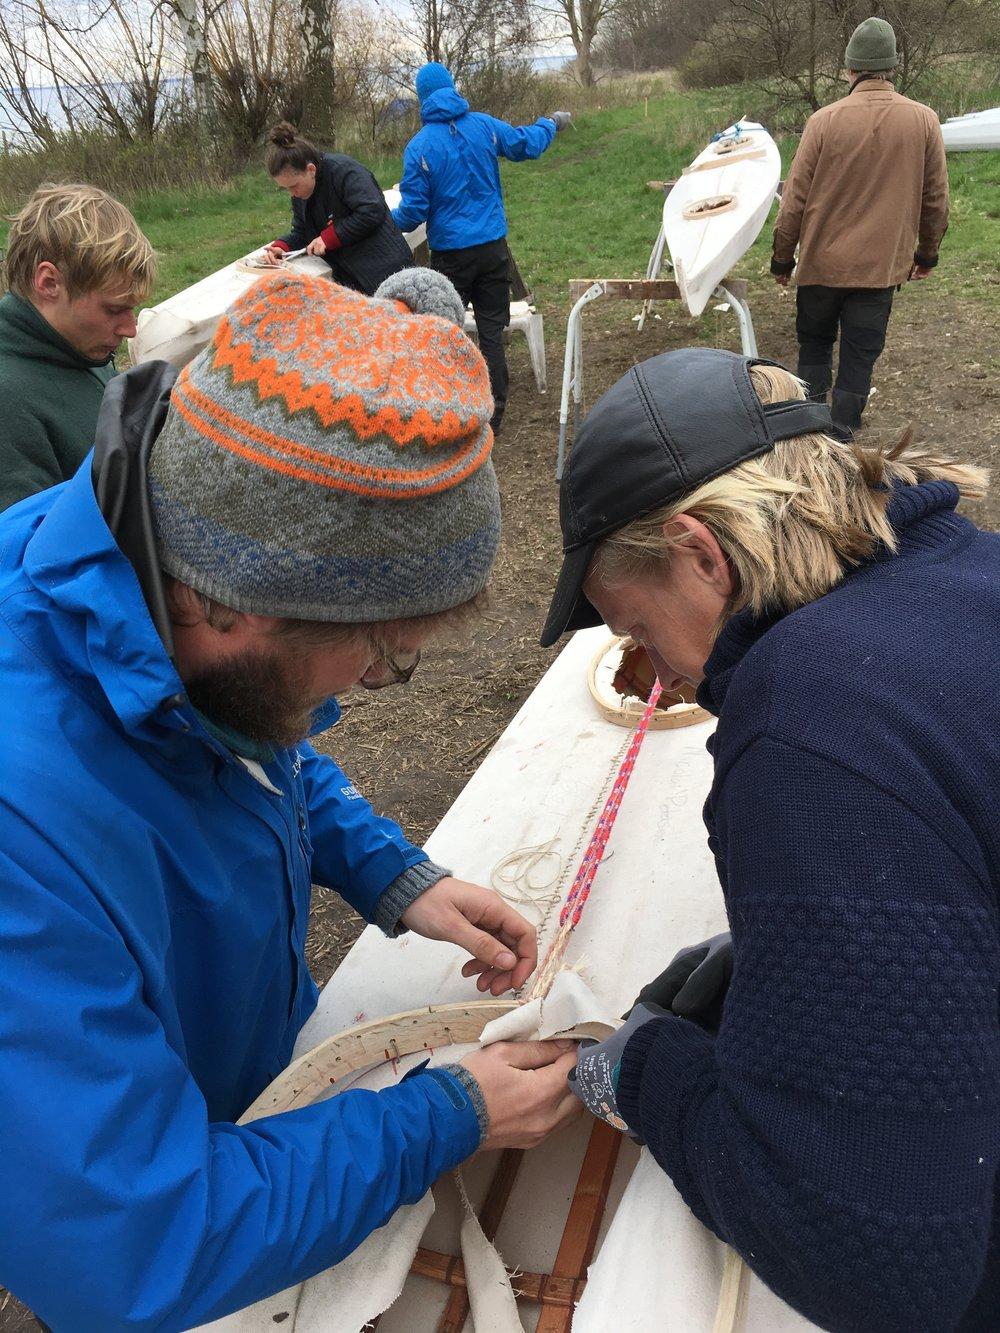 På Paul Petersens Idrætsinstitut bygger man sin egen kajak - med en god del hjælp fra andre!